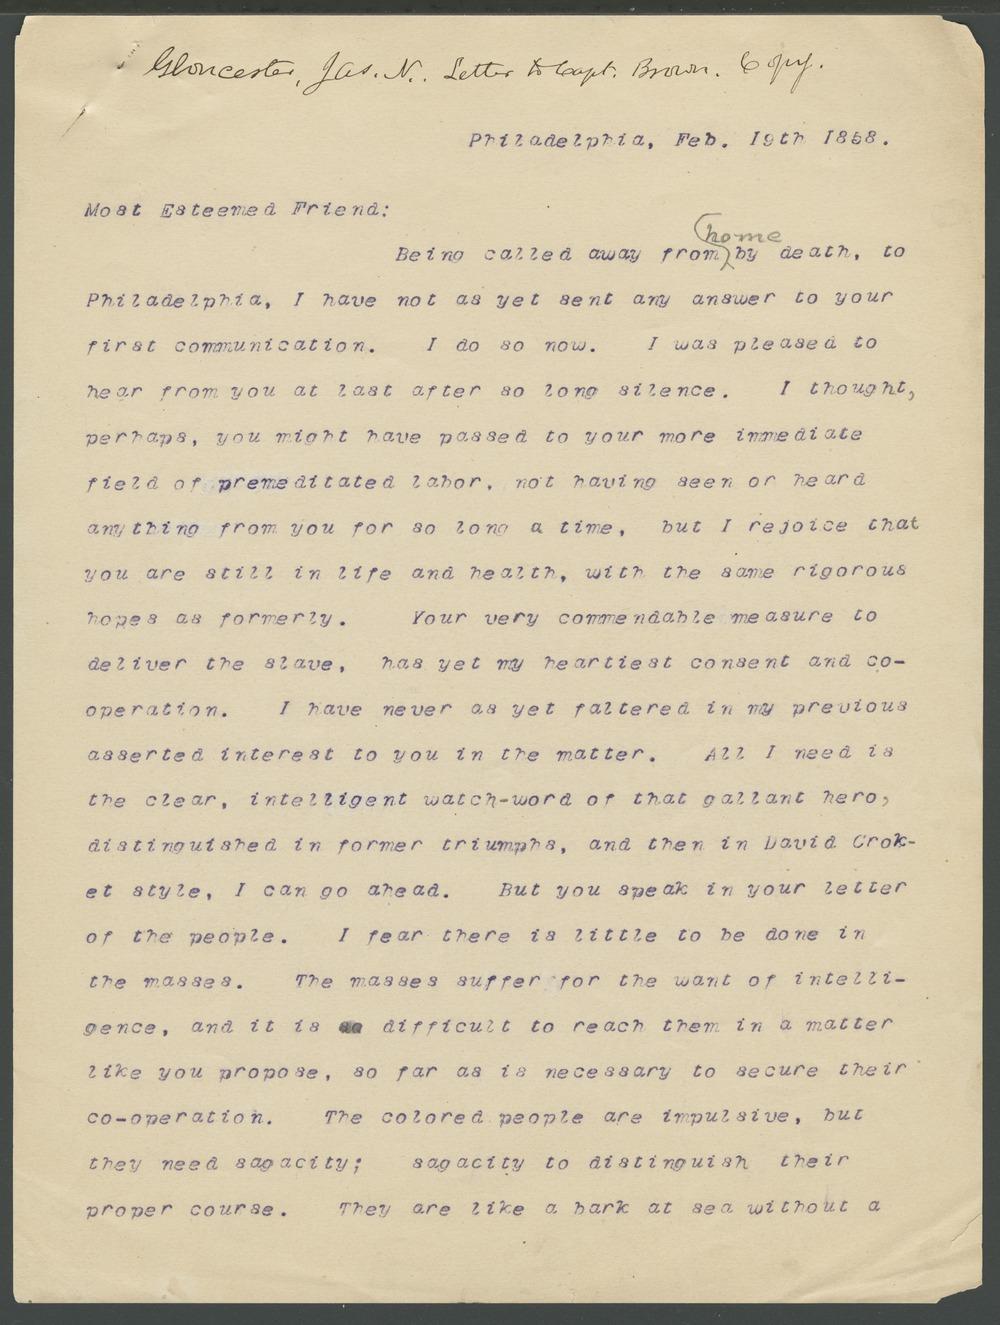 James N. Gloucester to John Brown - 5